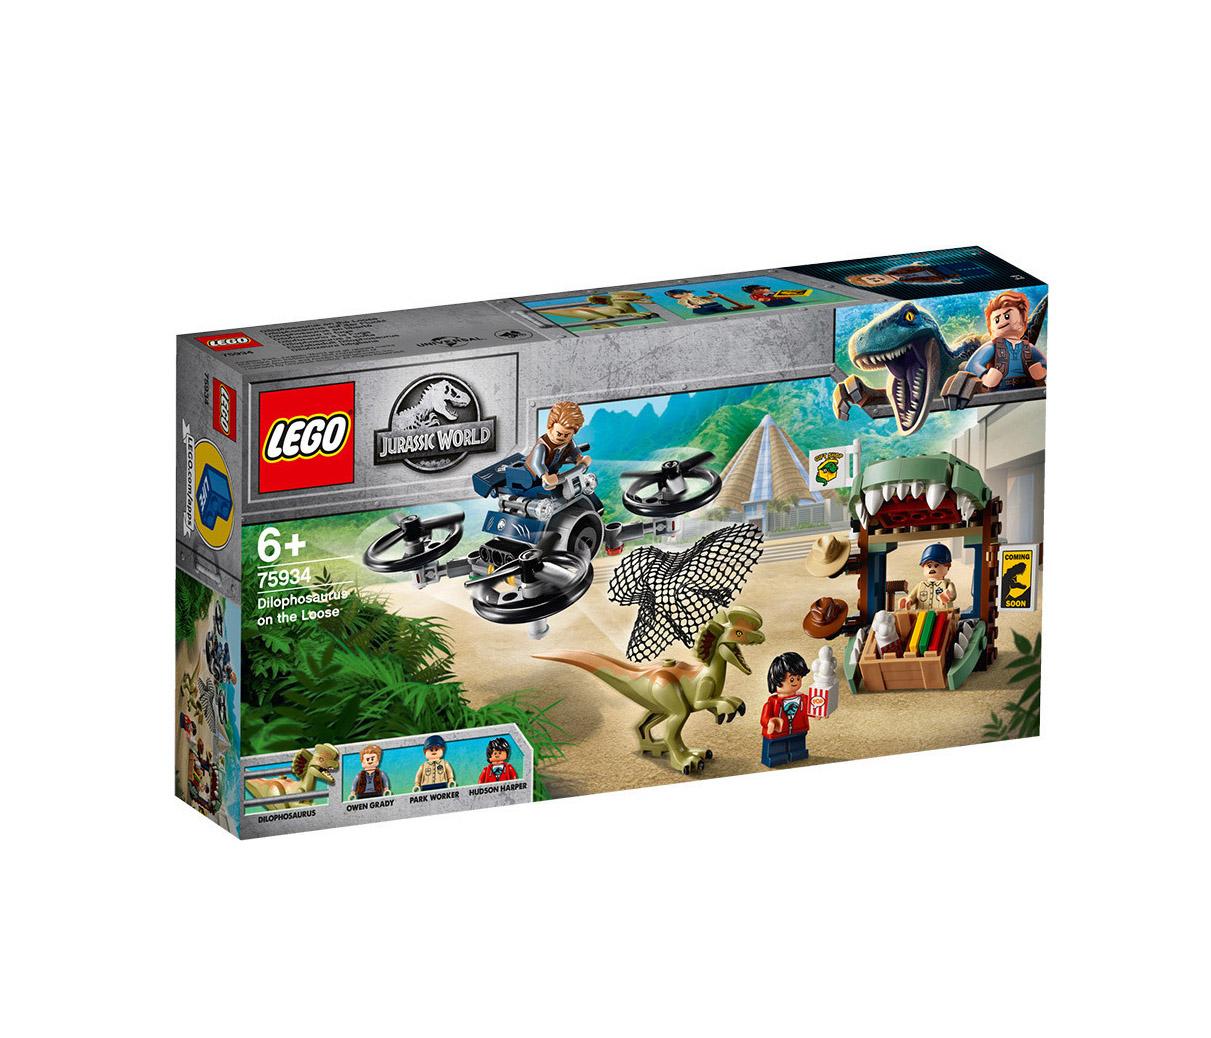 Lego Jurassic World: Dilophosaurus On The Loose 75934